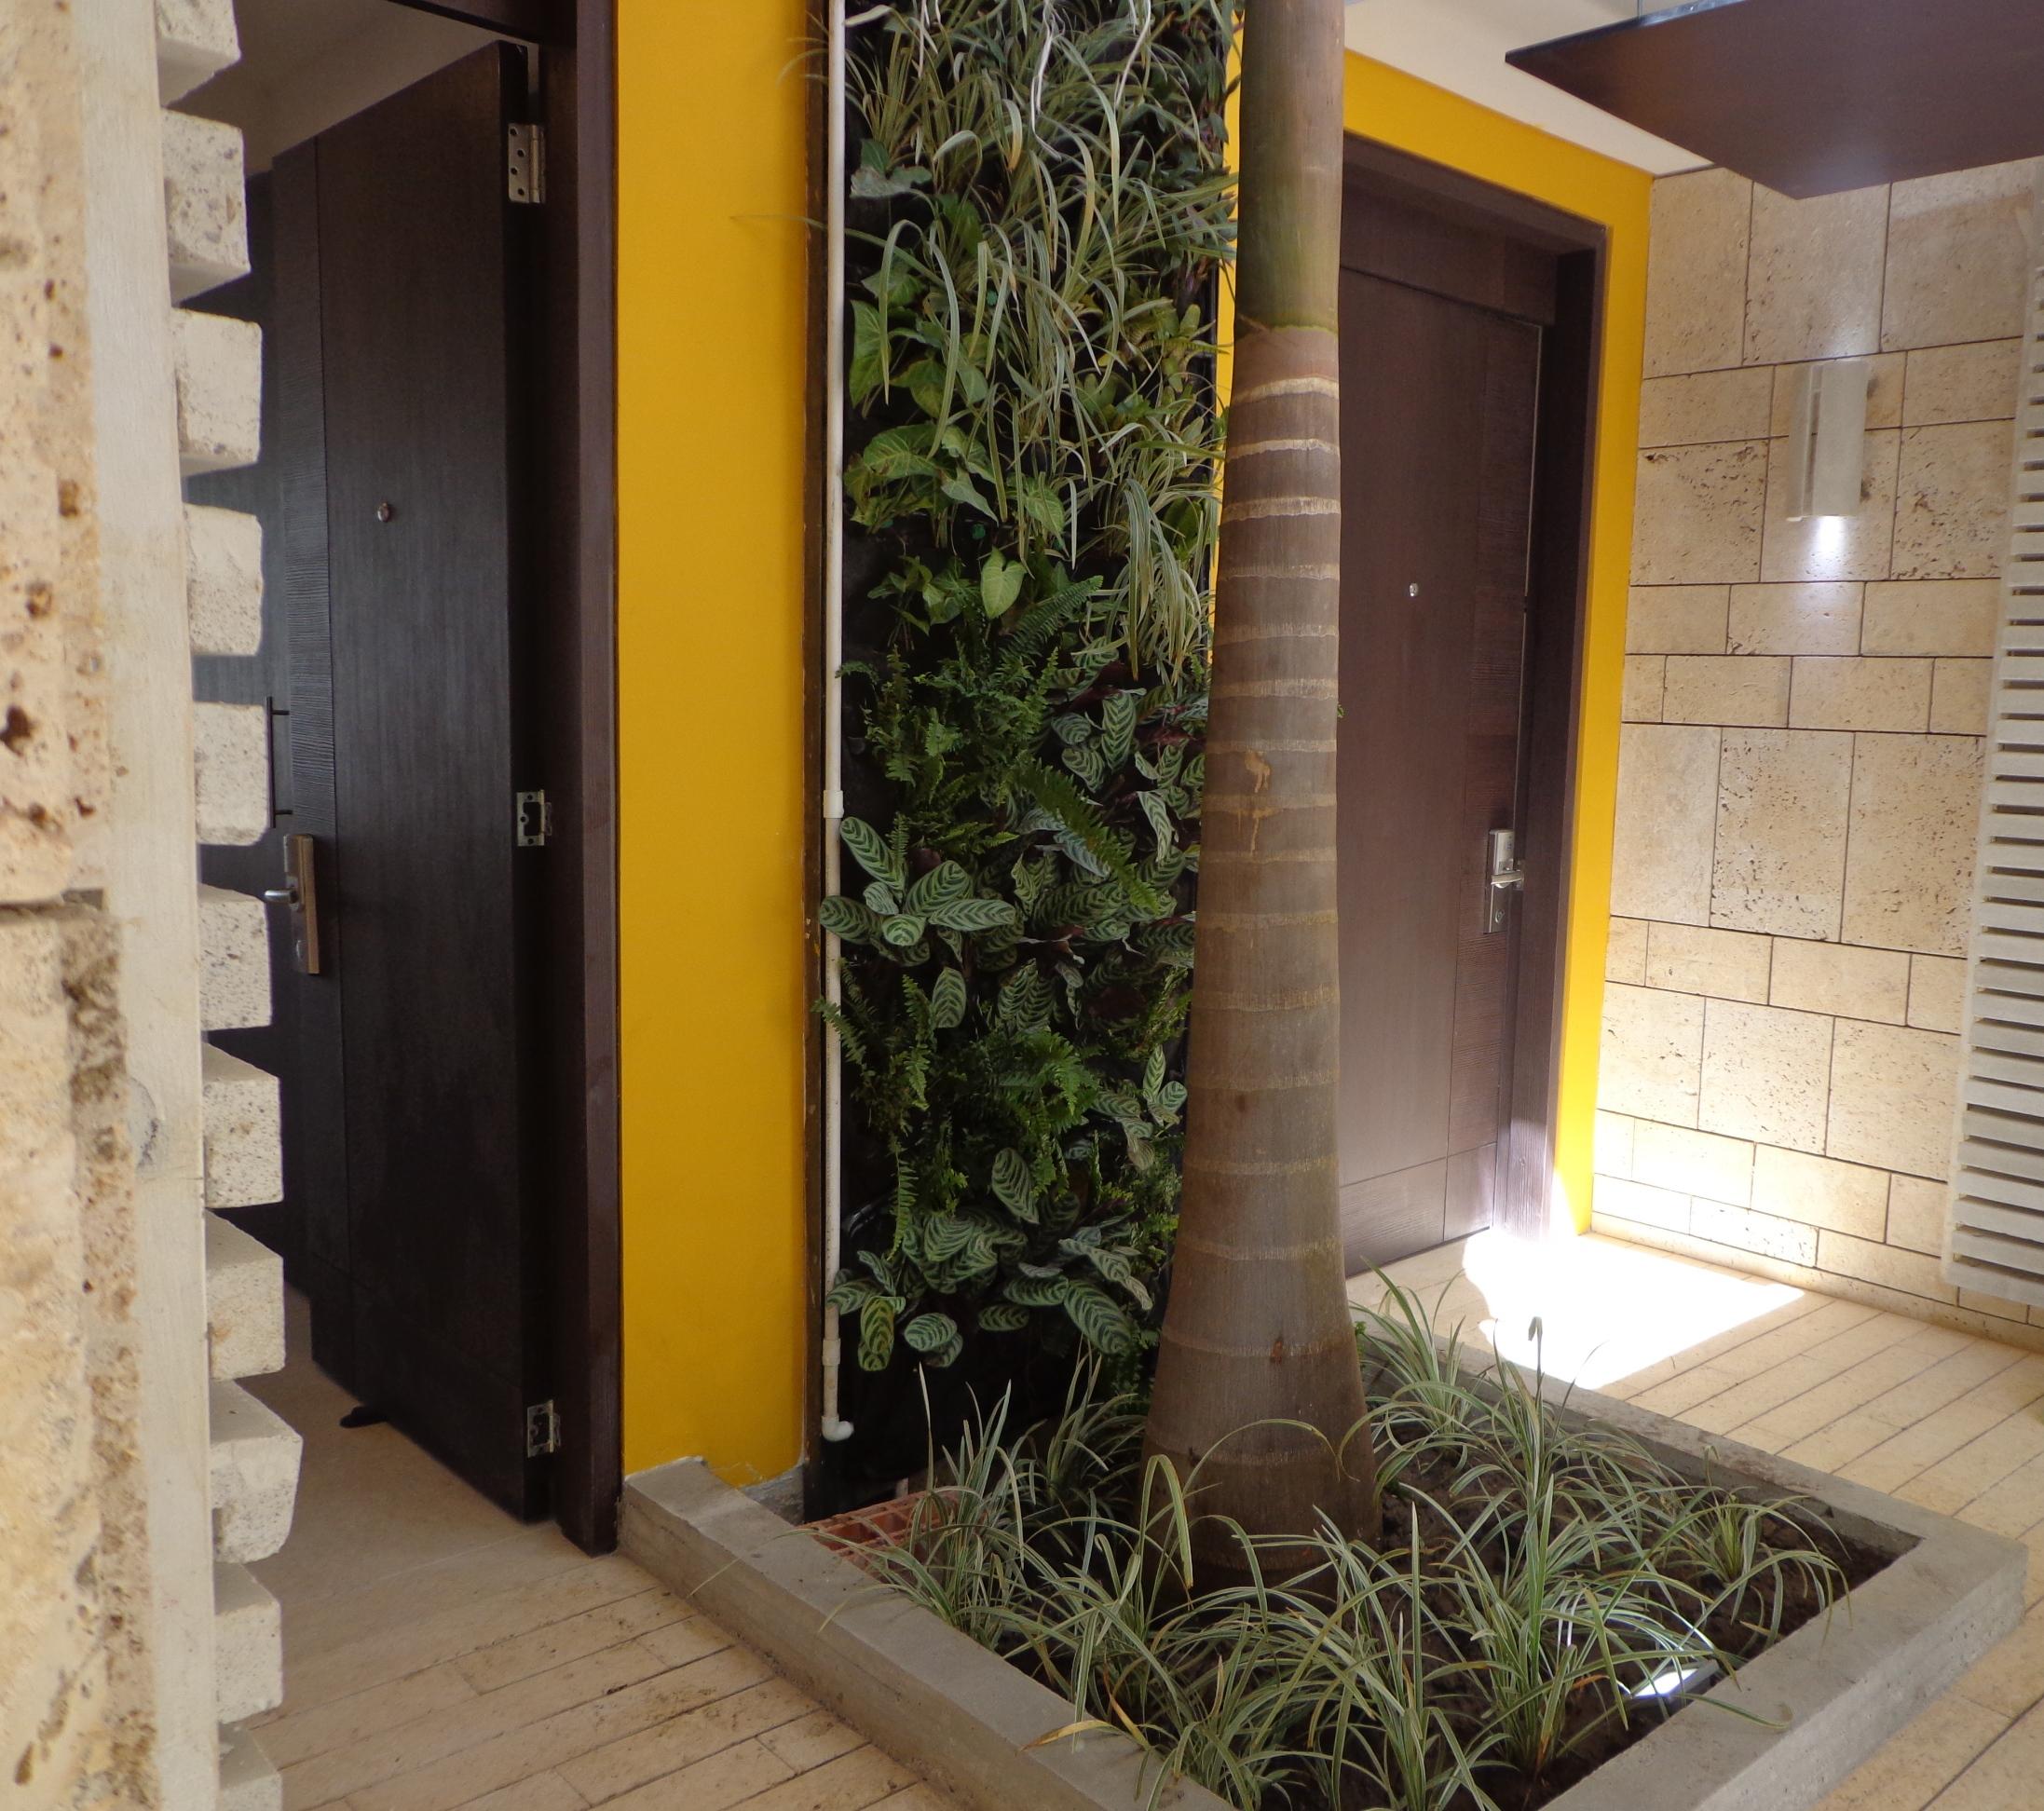 Jardin vertical interior